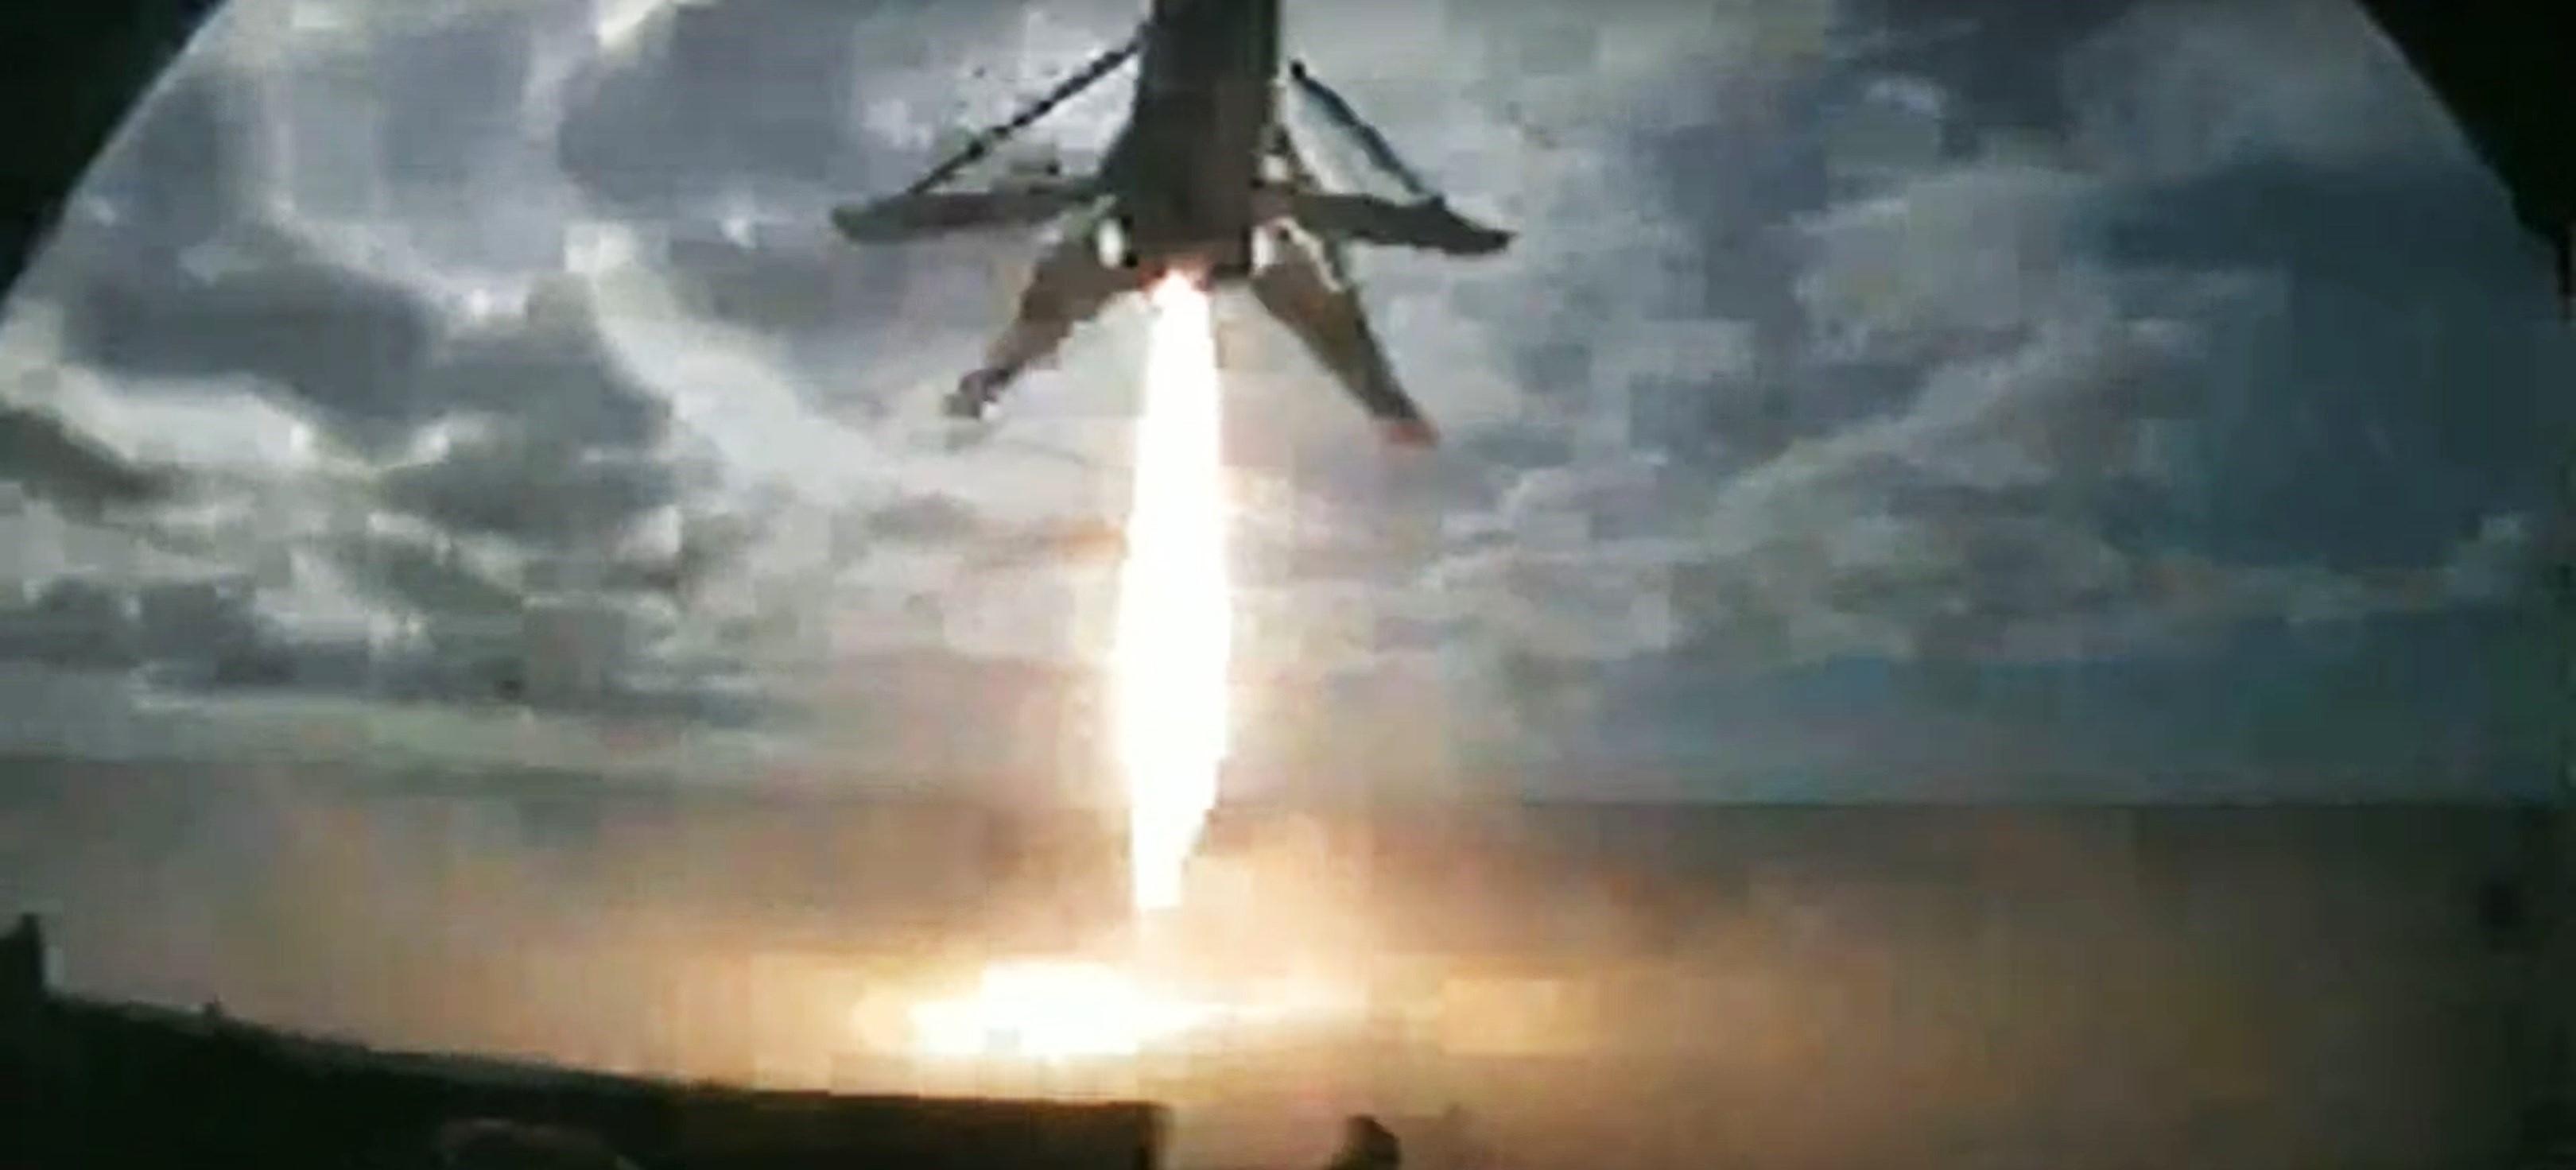 Starlink-1 v1.0 webcast (SpaceX) B1048 OCISLY landing 1